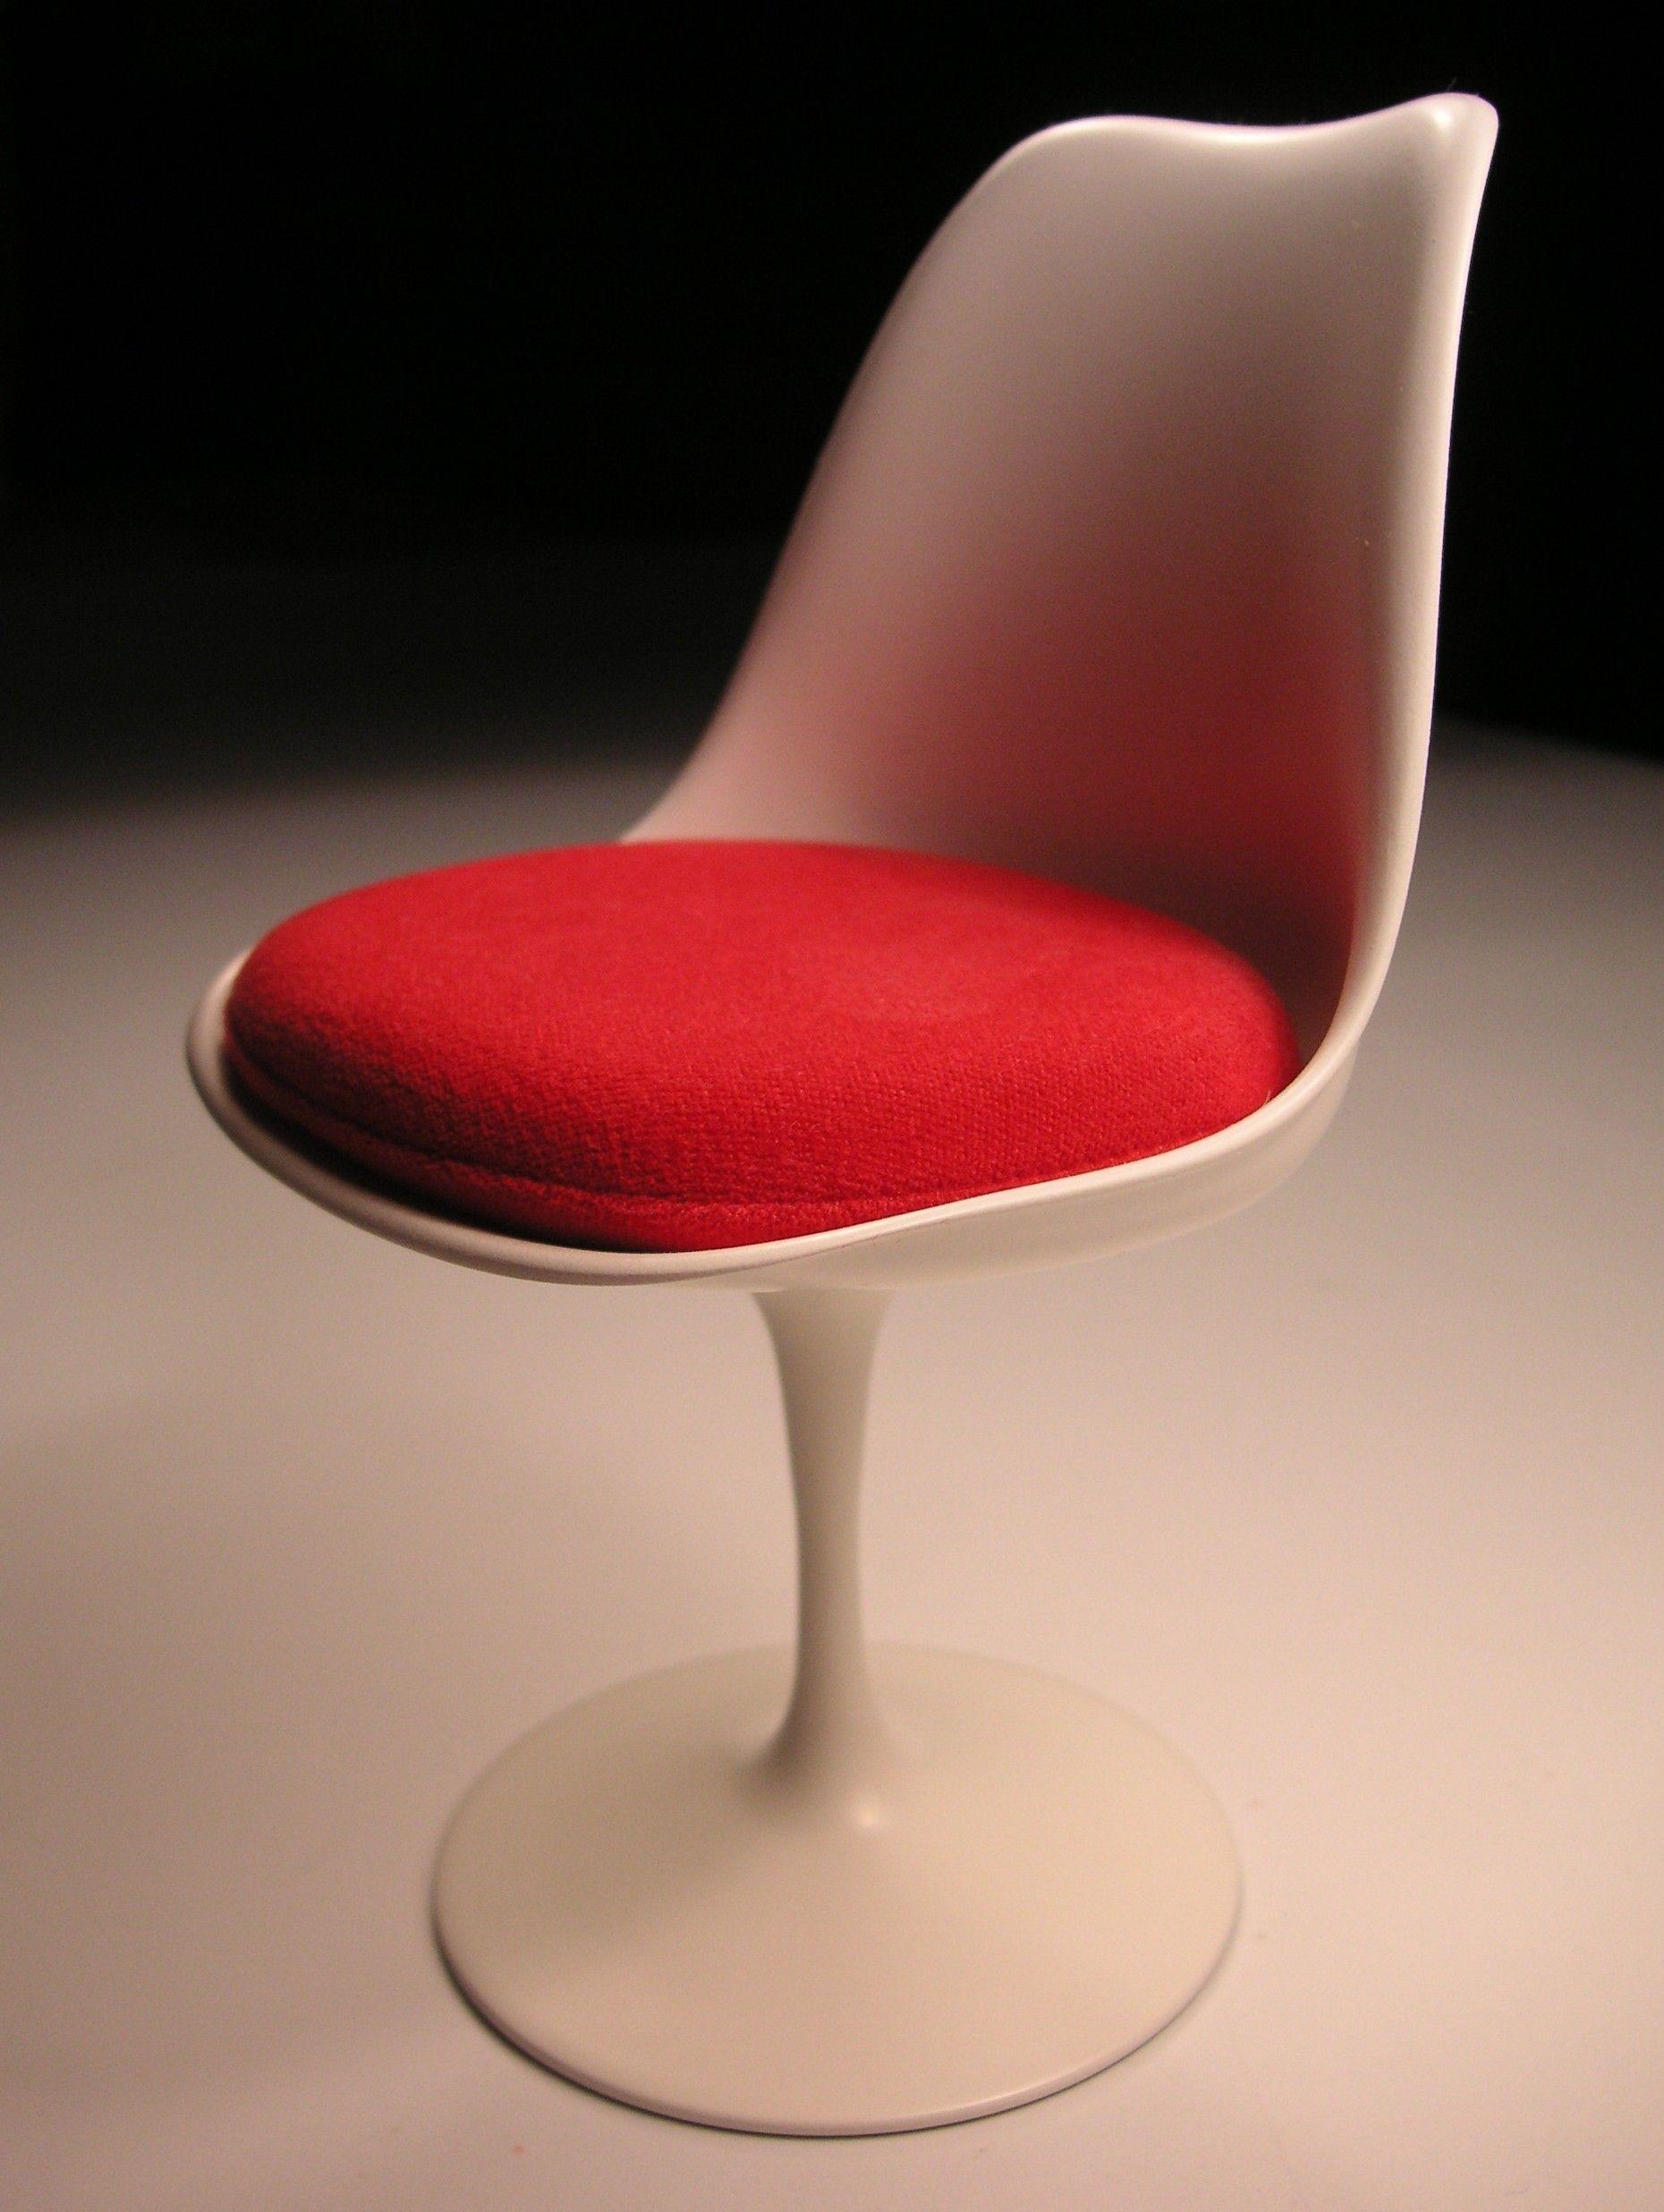 design for less furniture. brilliant furniture product design with design for less furniture